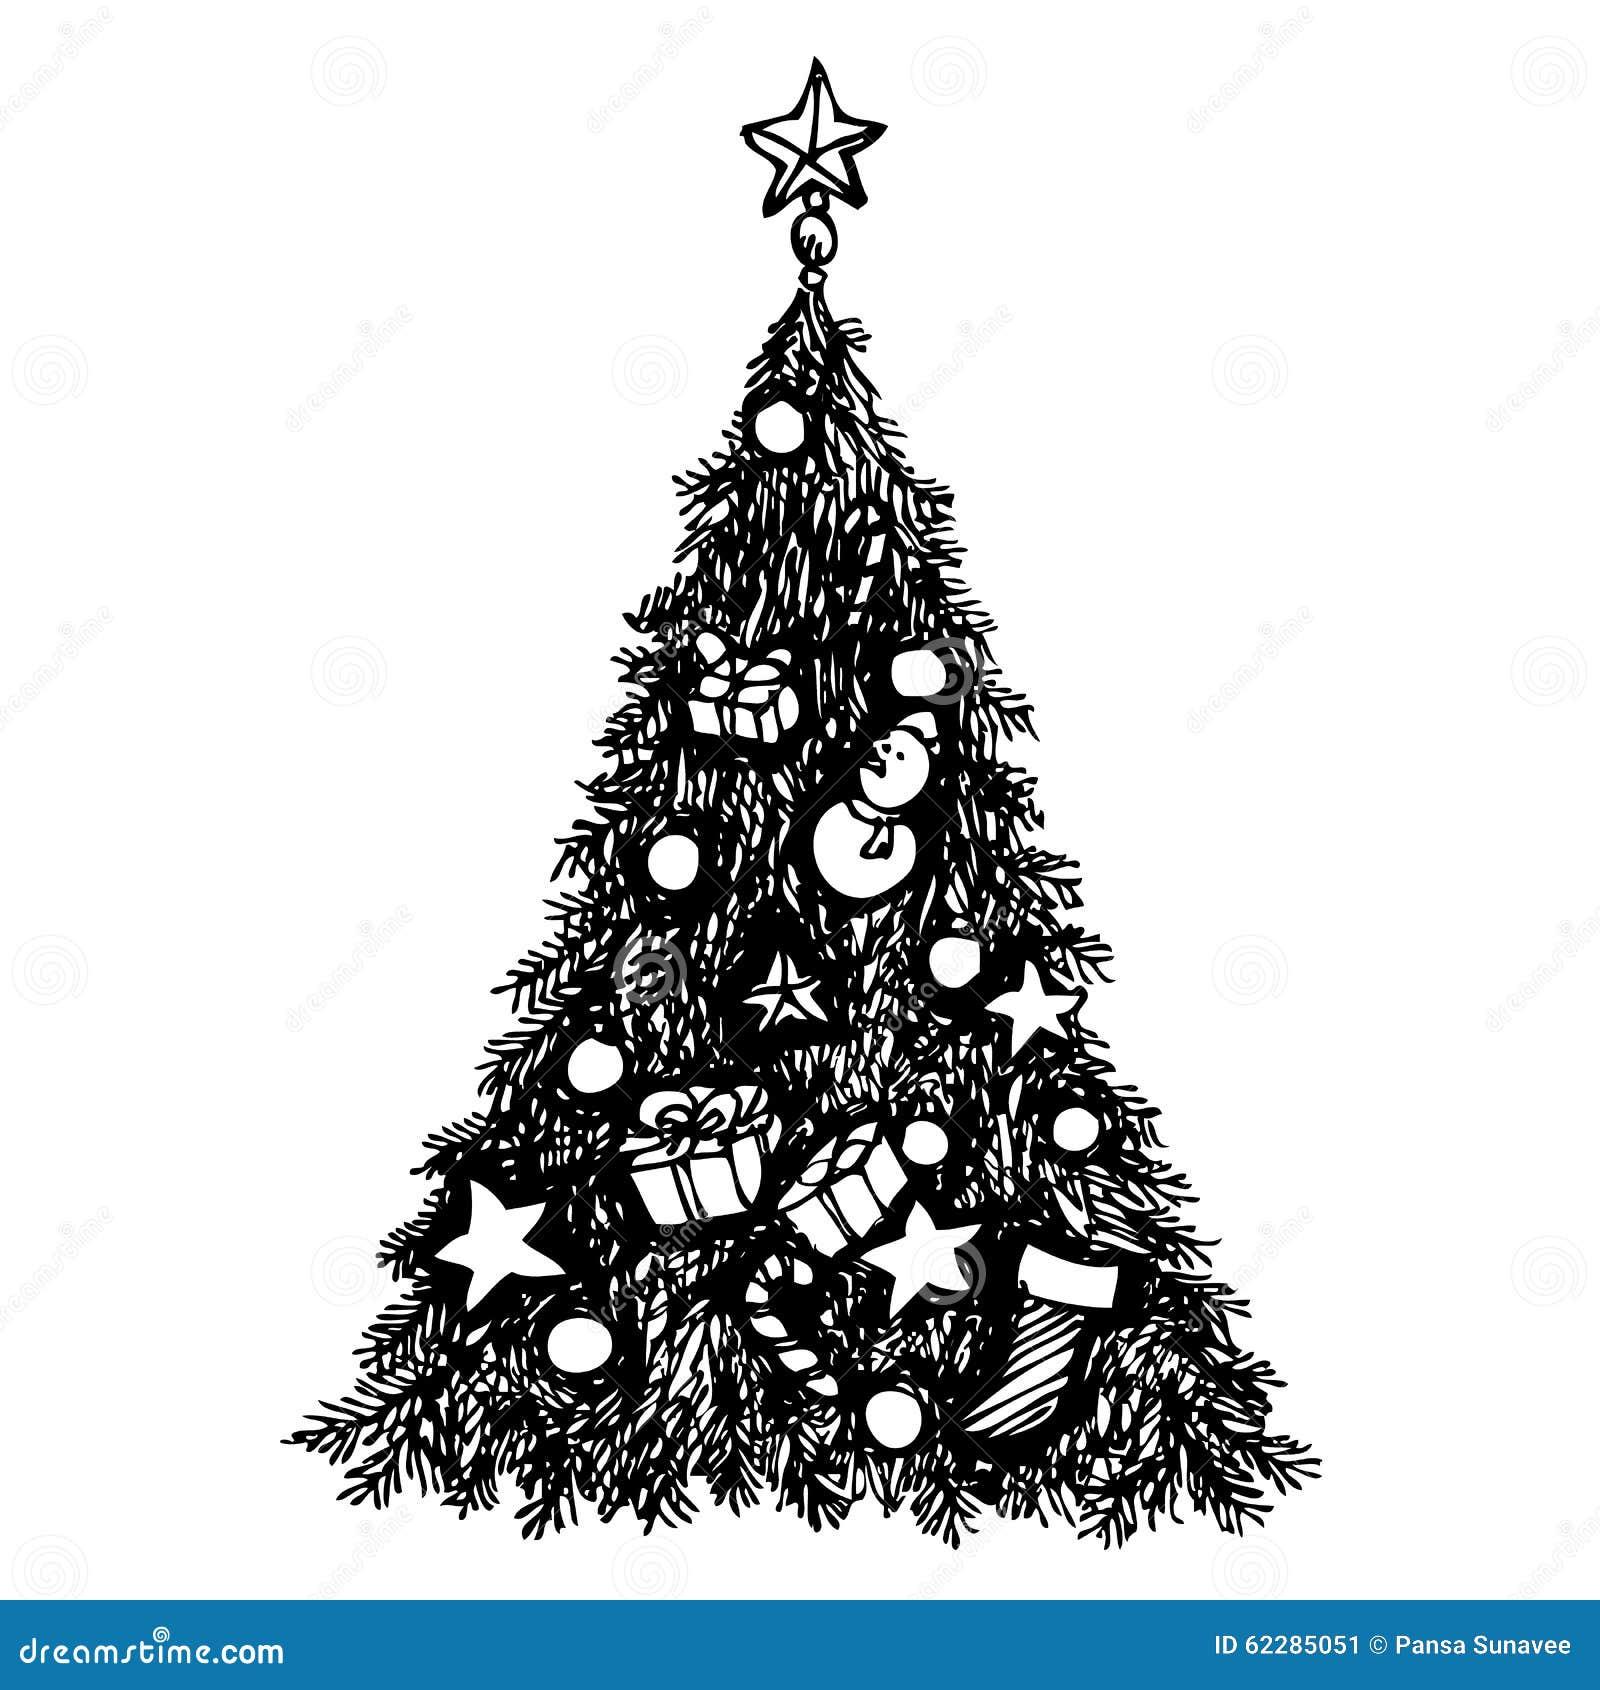 Grunge Christmas Tree Stock Vector - Image 62285051